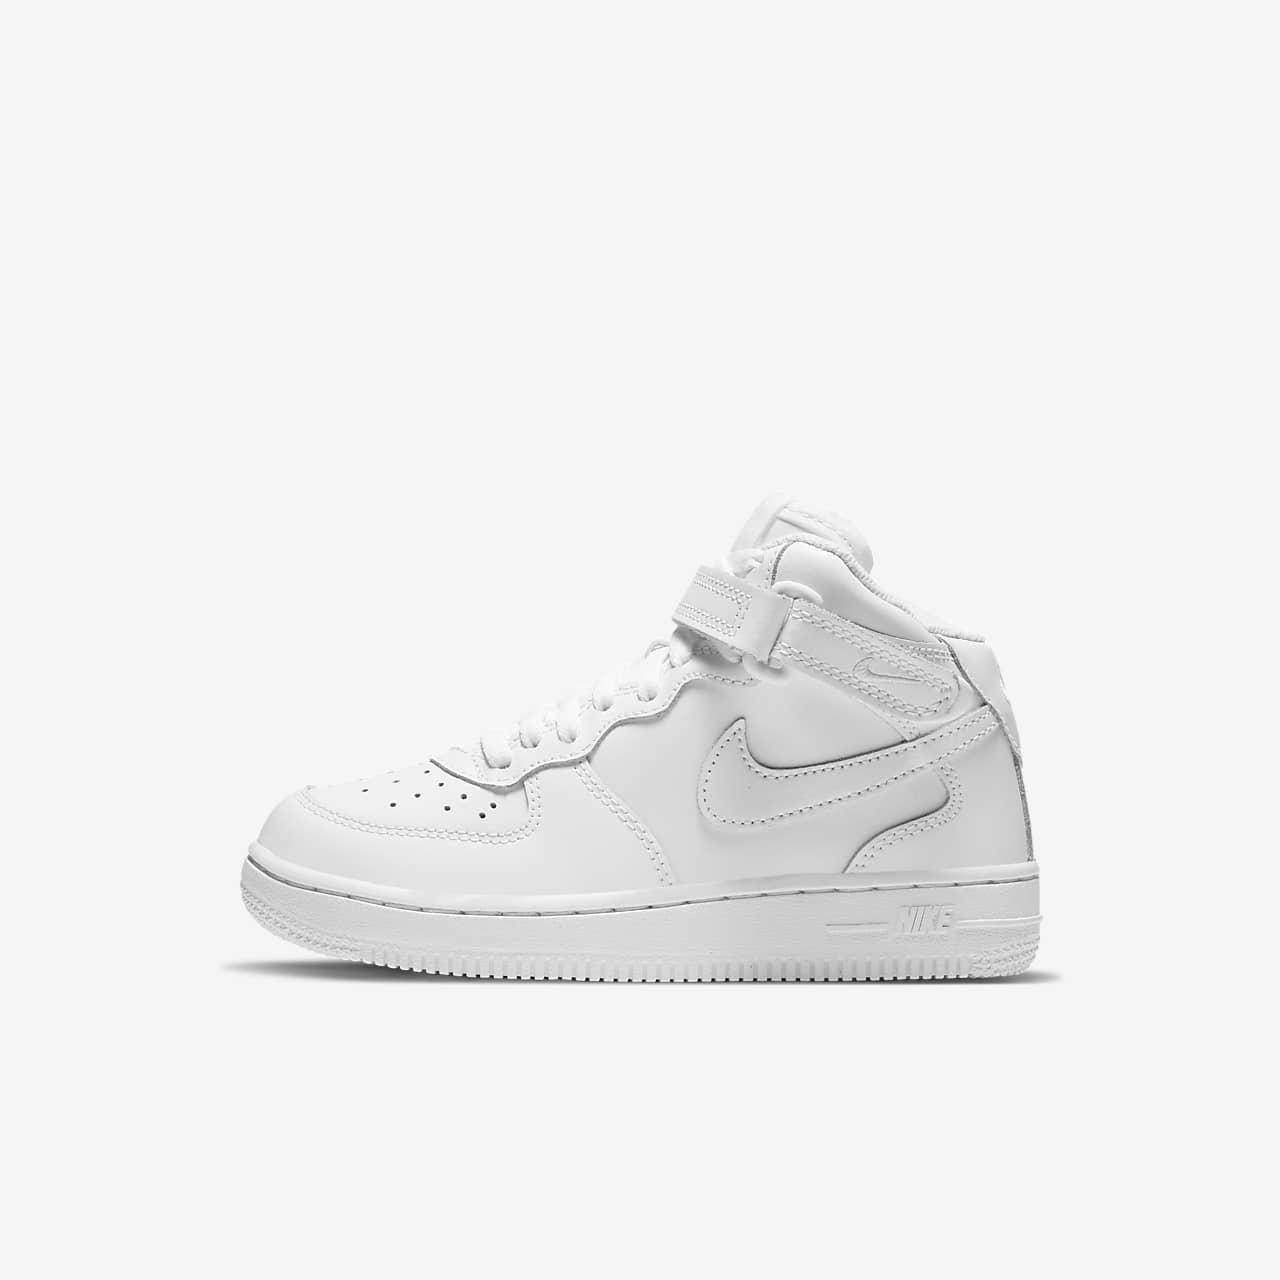 e9e717144551a Chaussure Nike Air Force 1 Mid pour Jeune enfant. Nike.com FR